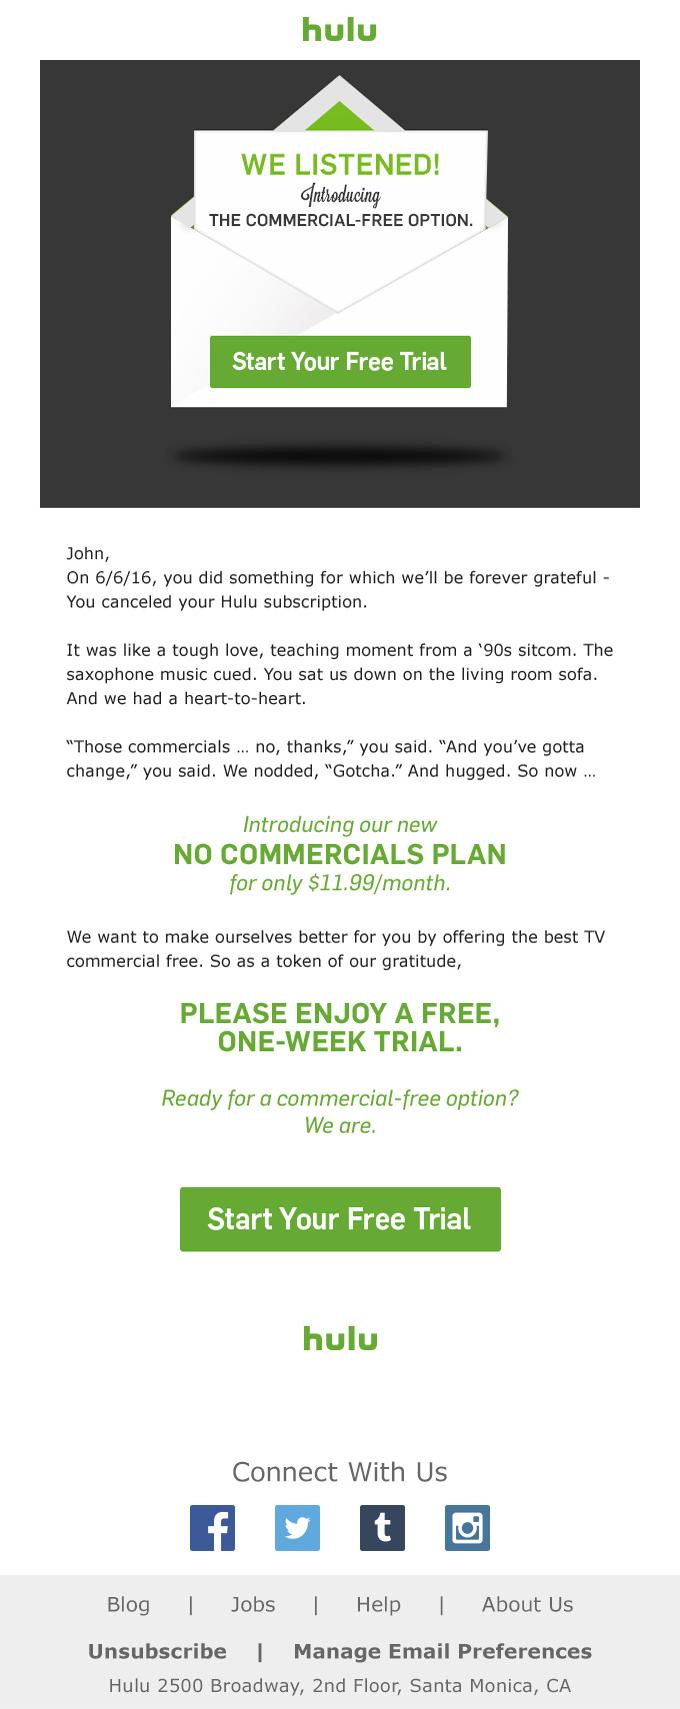 hulu email | Media | Email design, Design, Ios